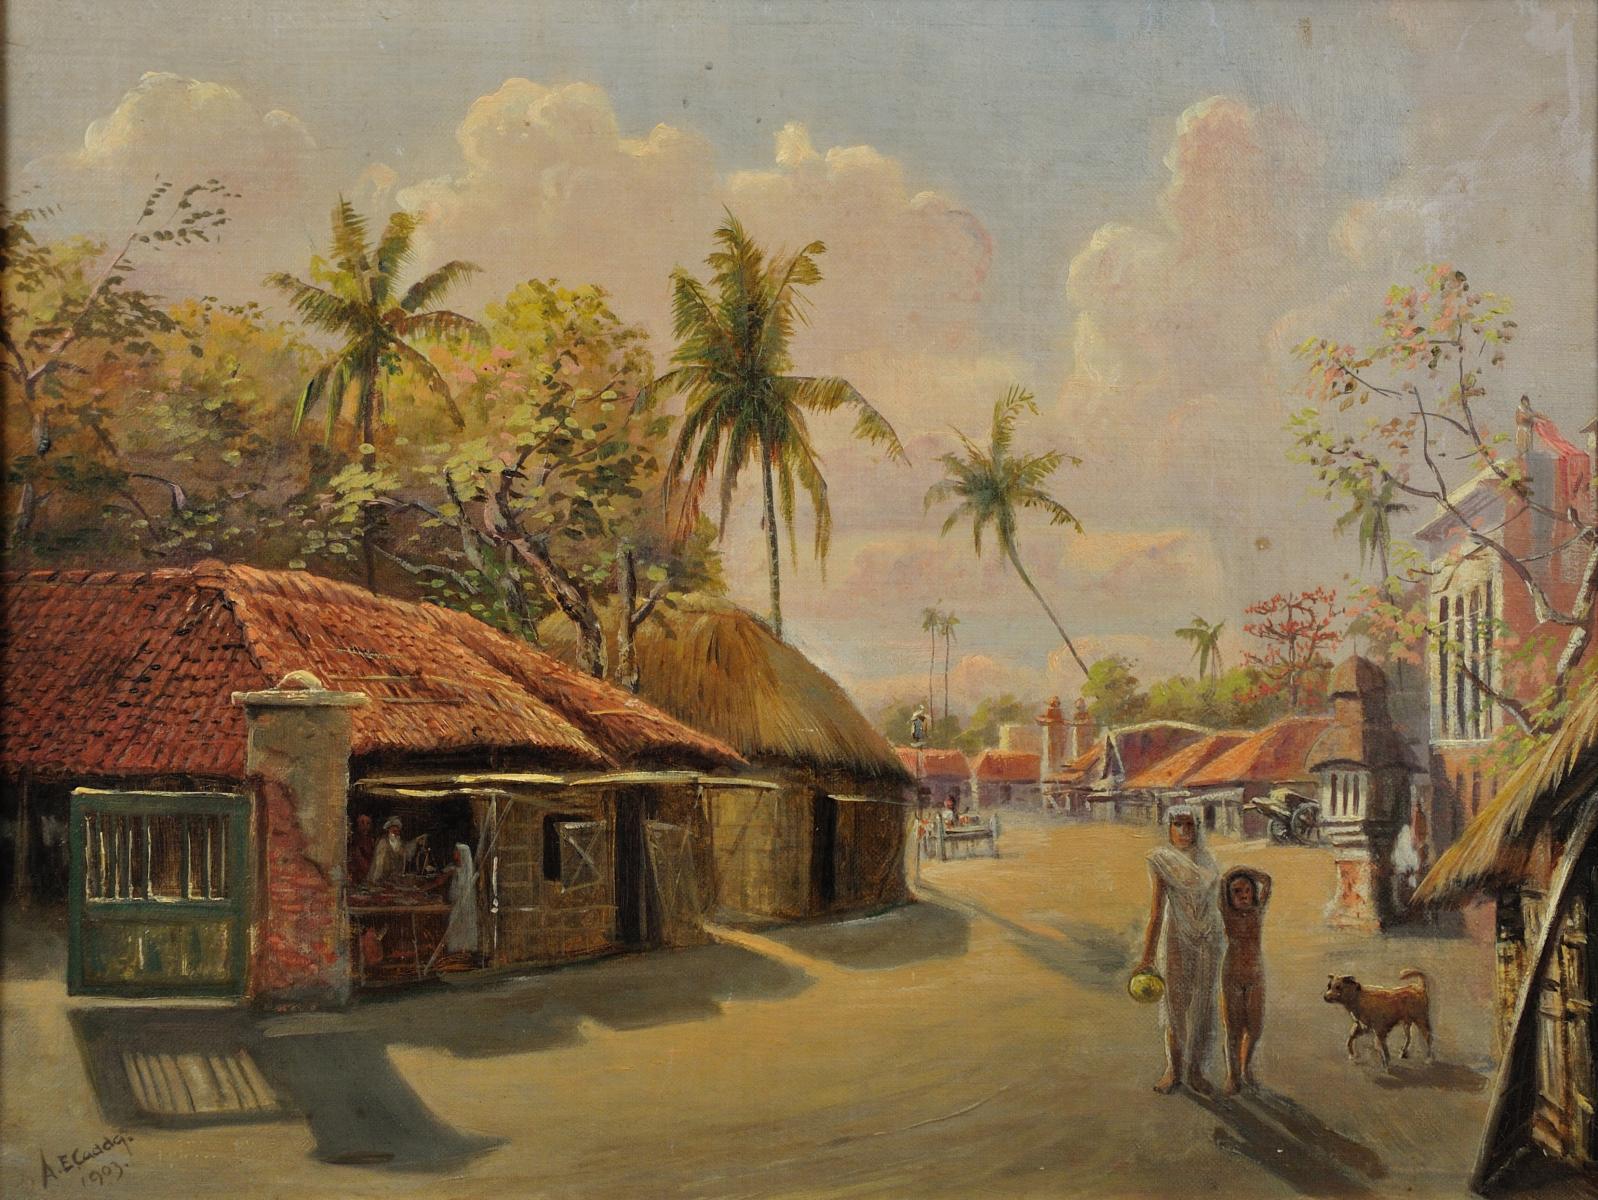 File:Village scene, Jagannath, India.jpgBeautiful Indian Village Paintings